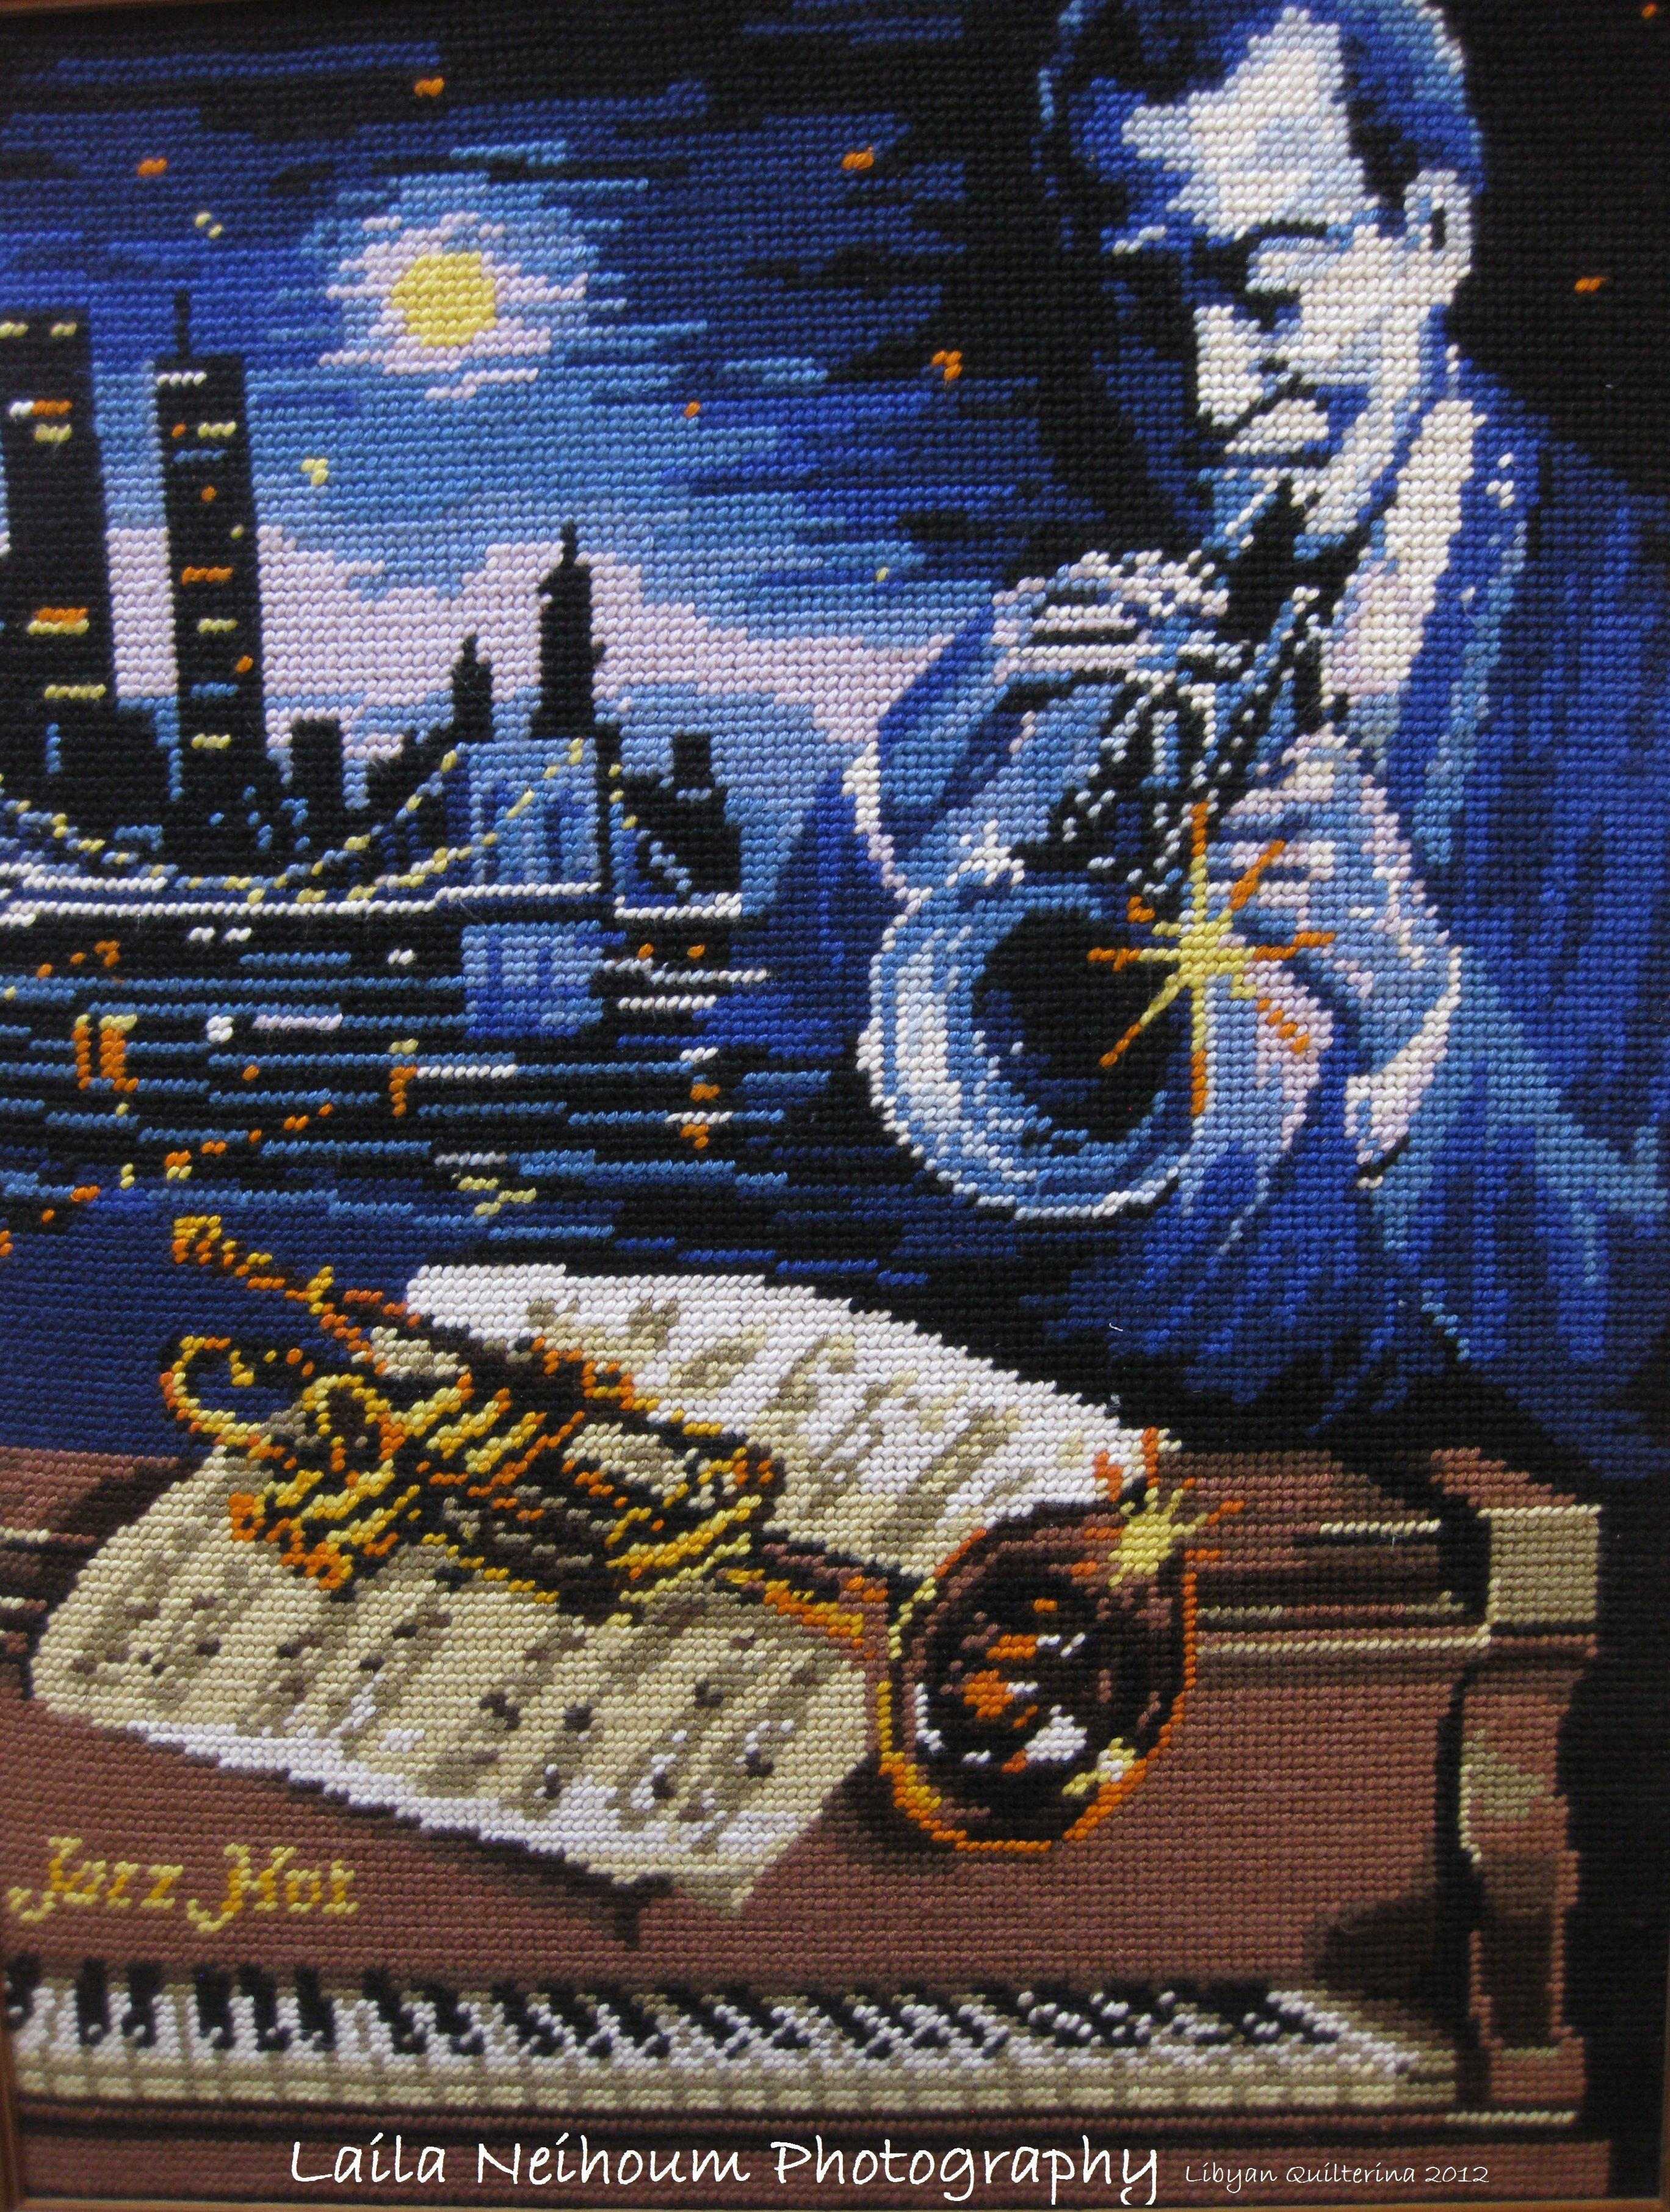 A musical vintage cross stitch piece